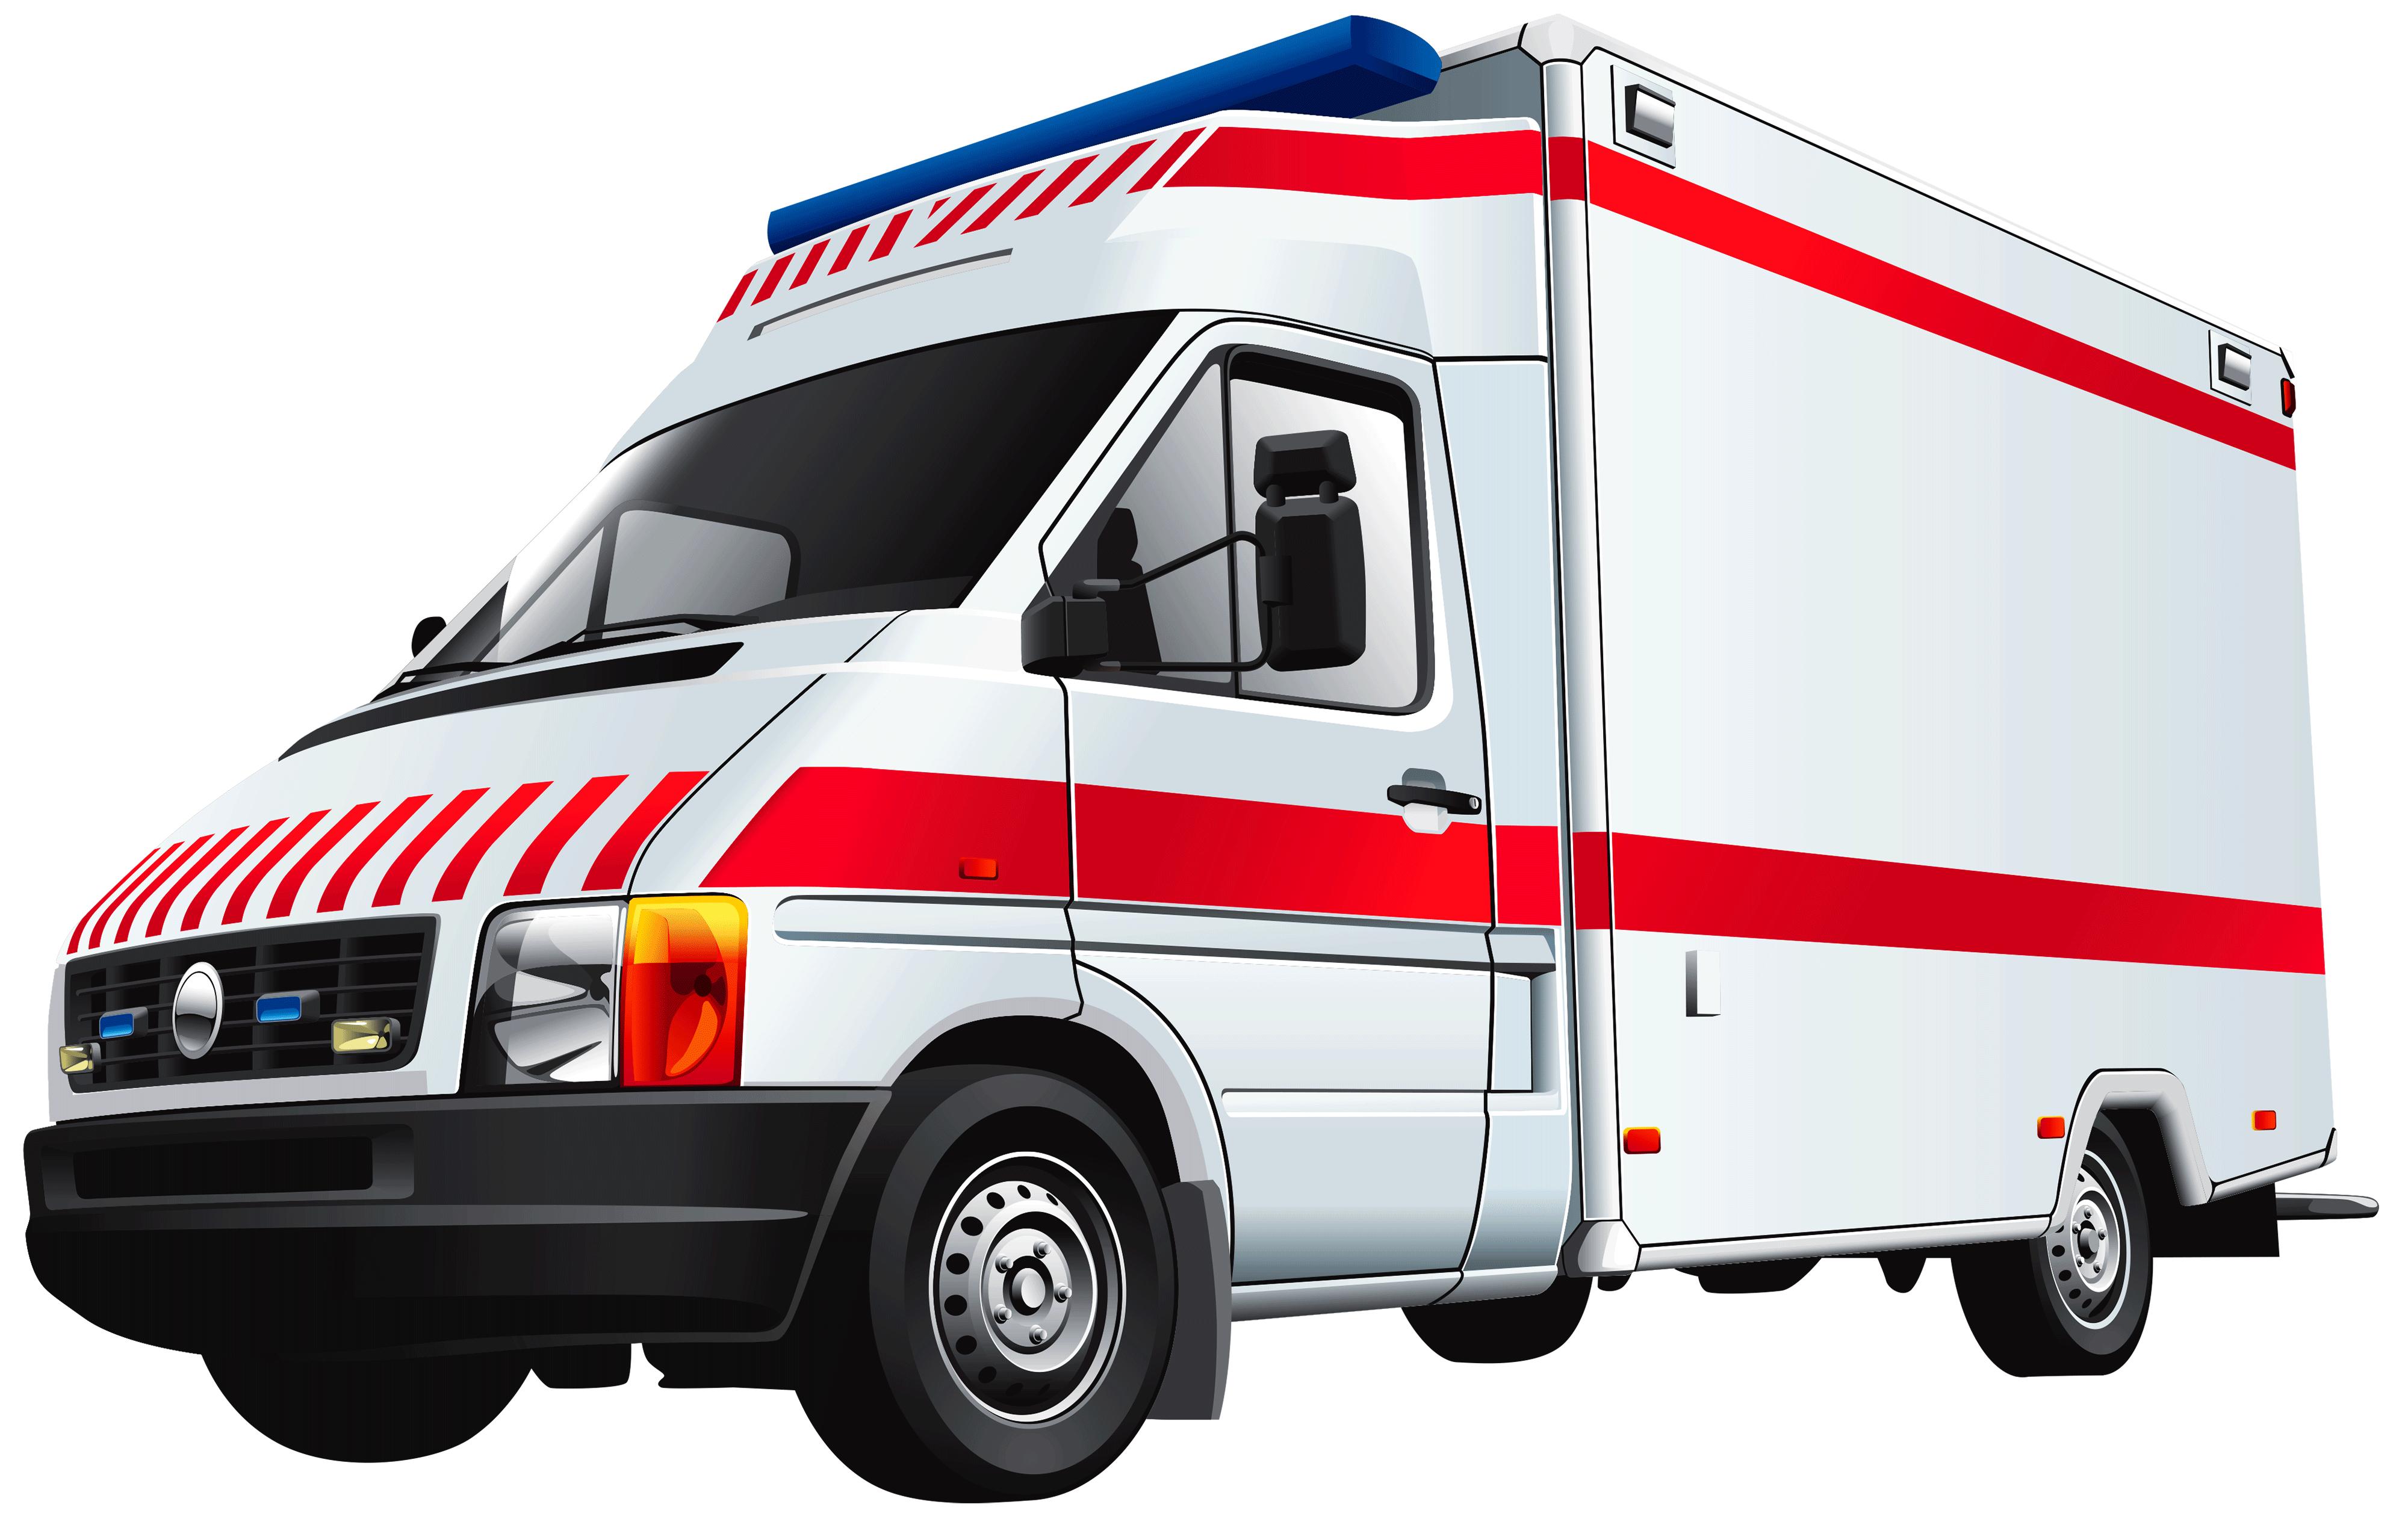 Download image PlusPng.com  - Ambulance PNG